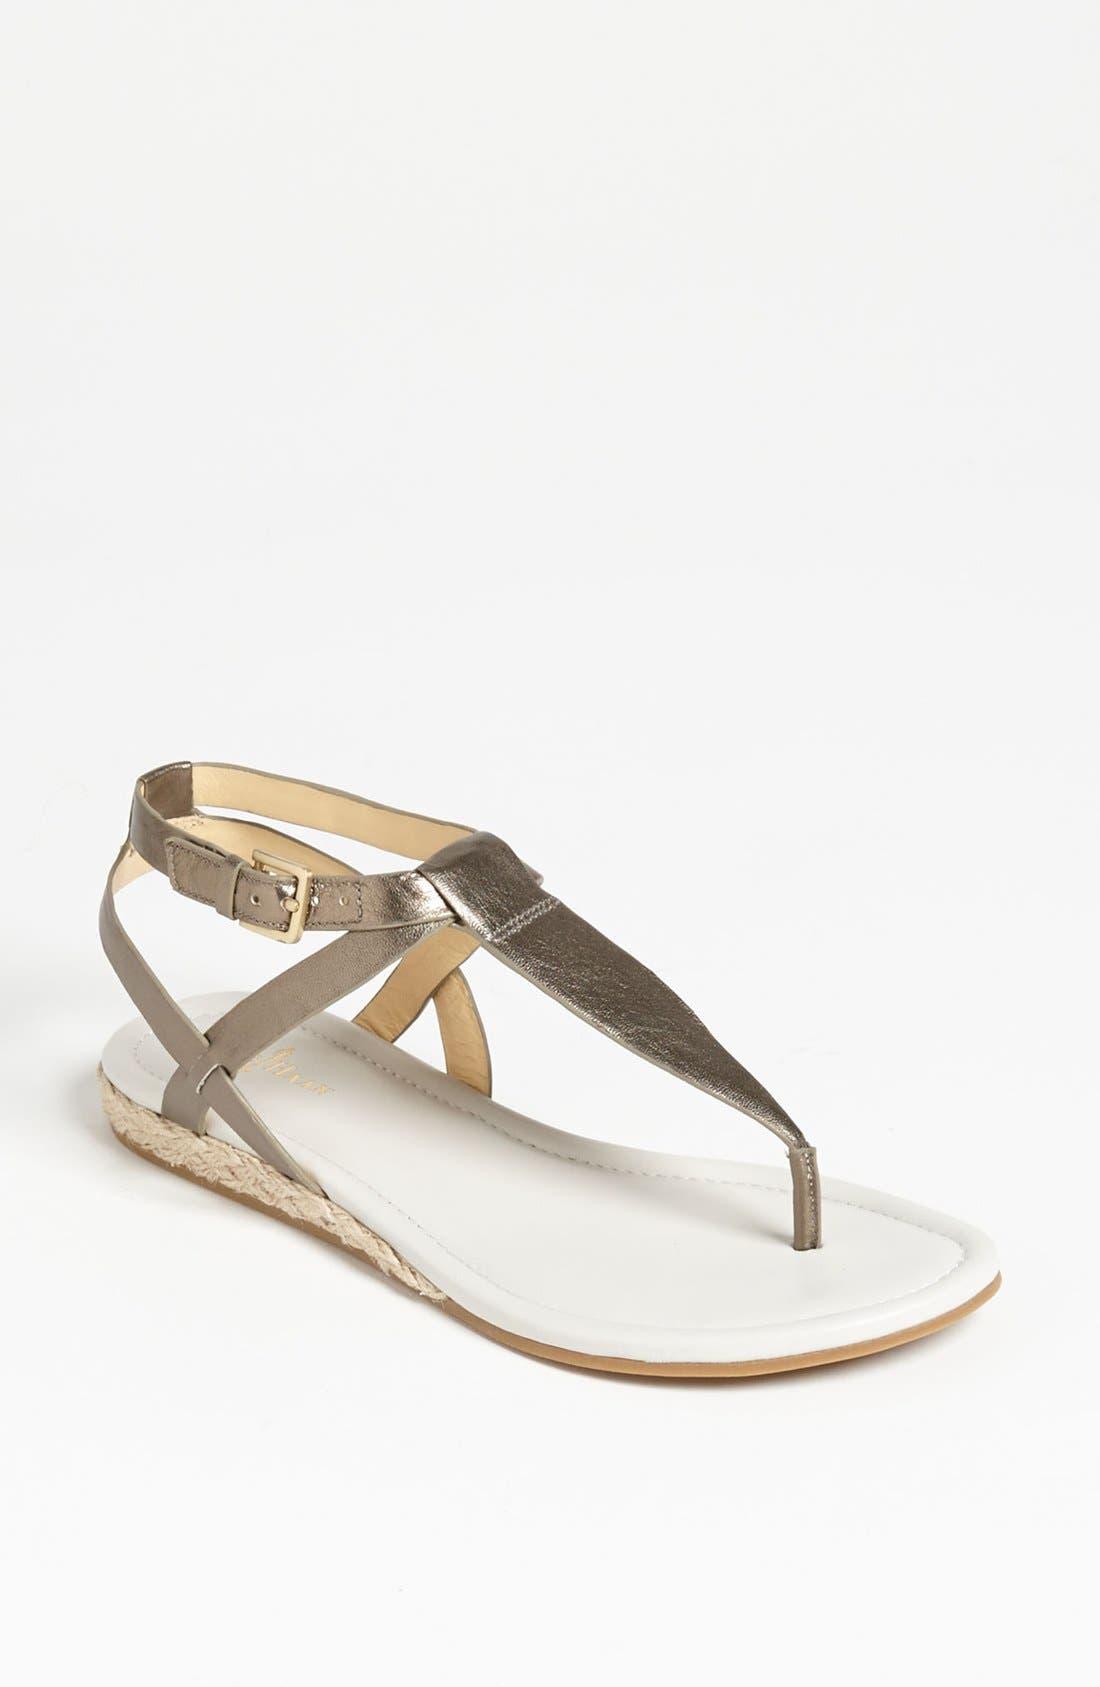 Main Image - Cole Haan 'Grove' Sandal